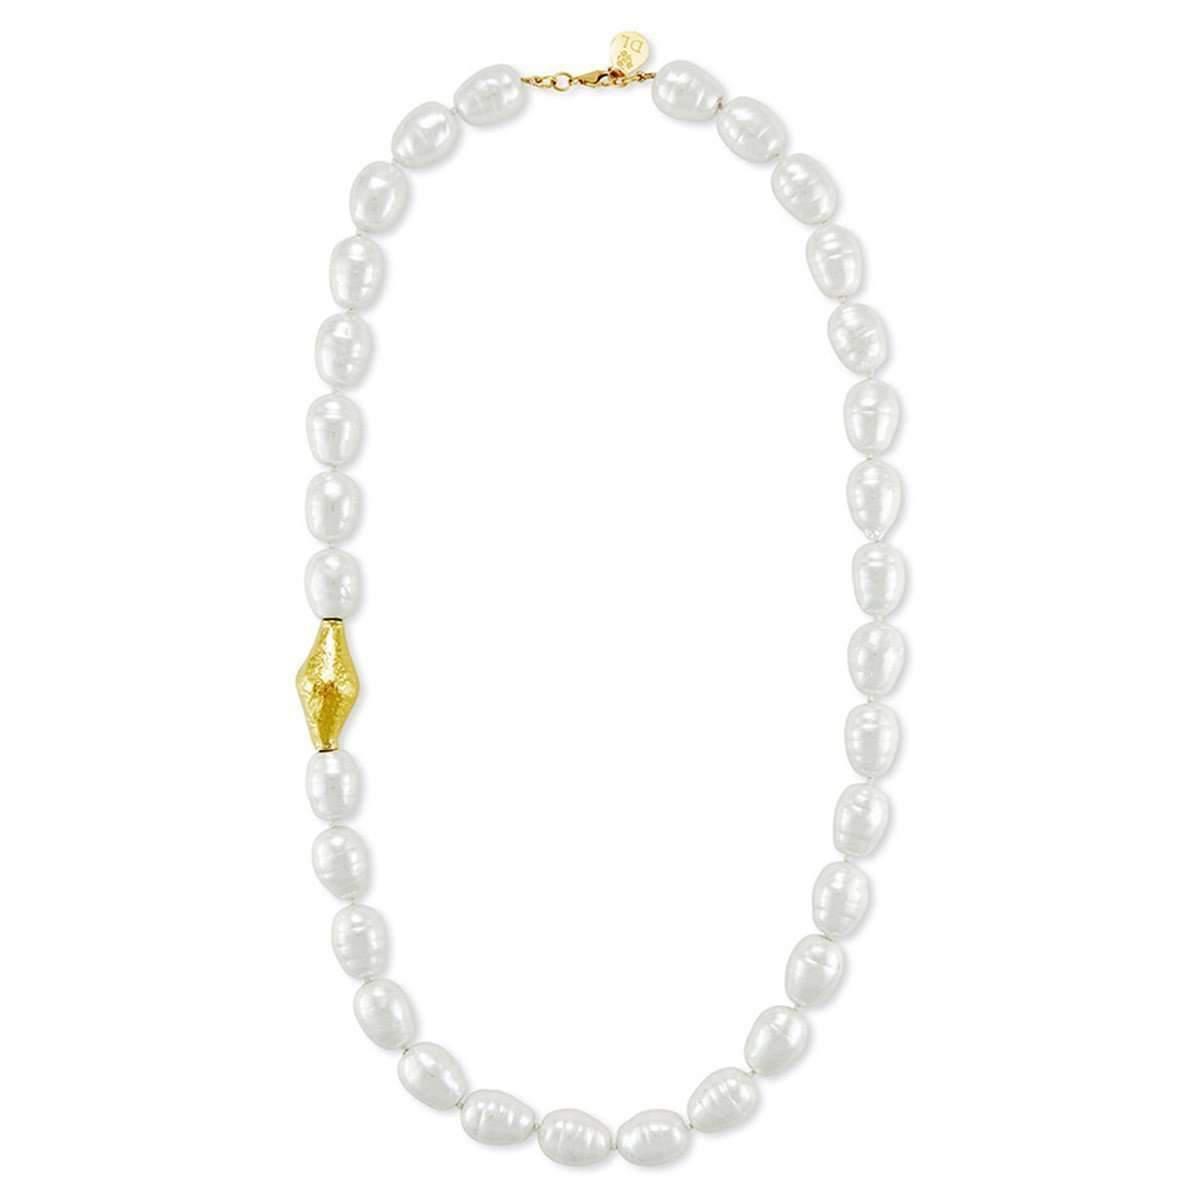 Devon Leigh Long Rainbow Agate Beaded Necklace MLiH0Wxrc